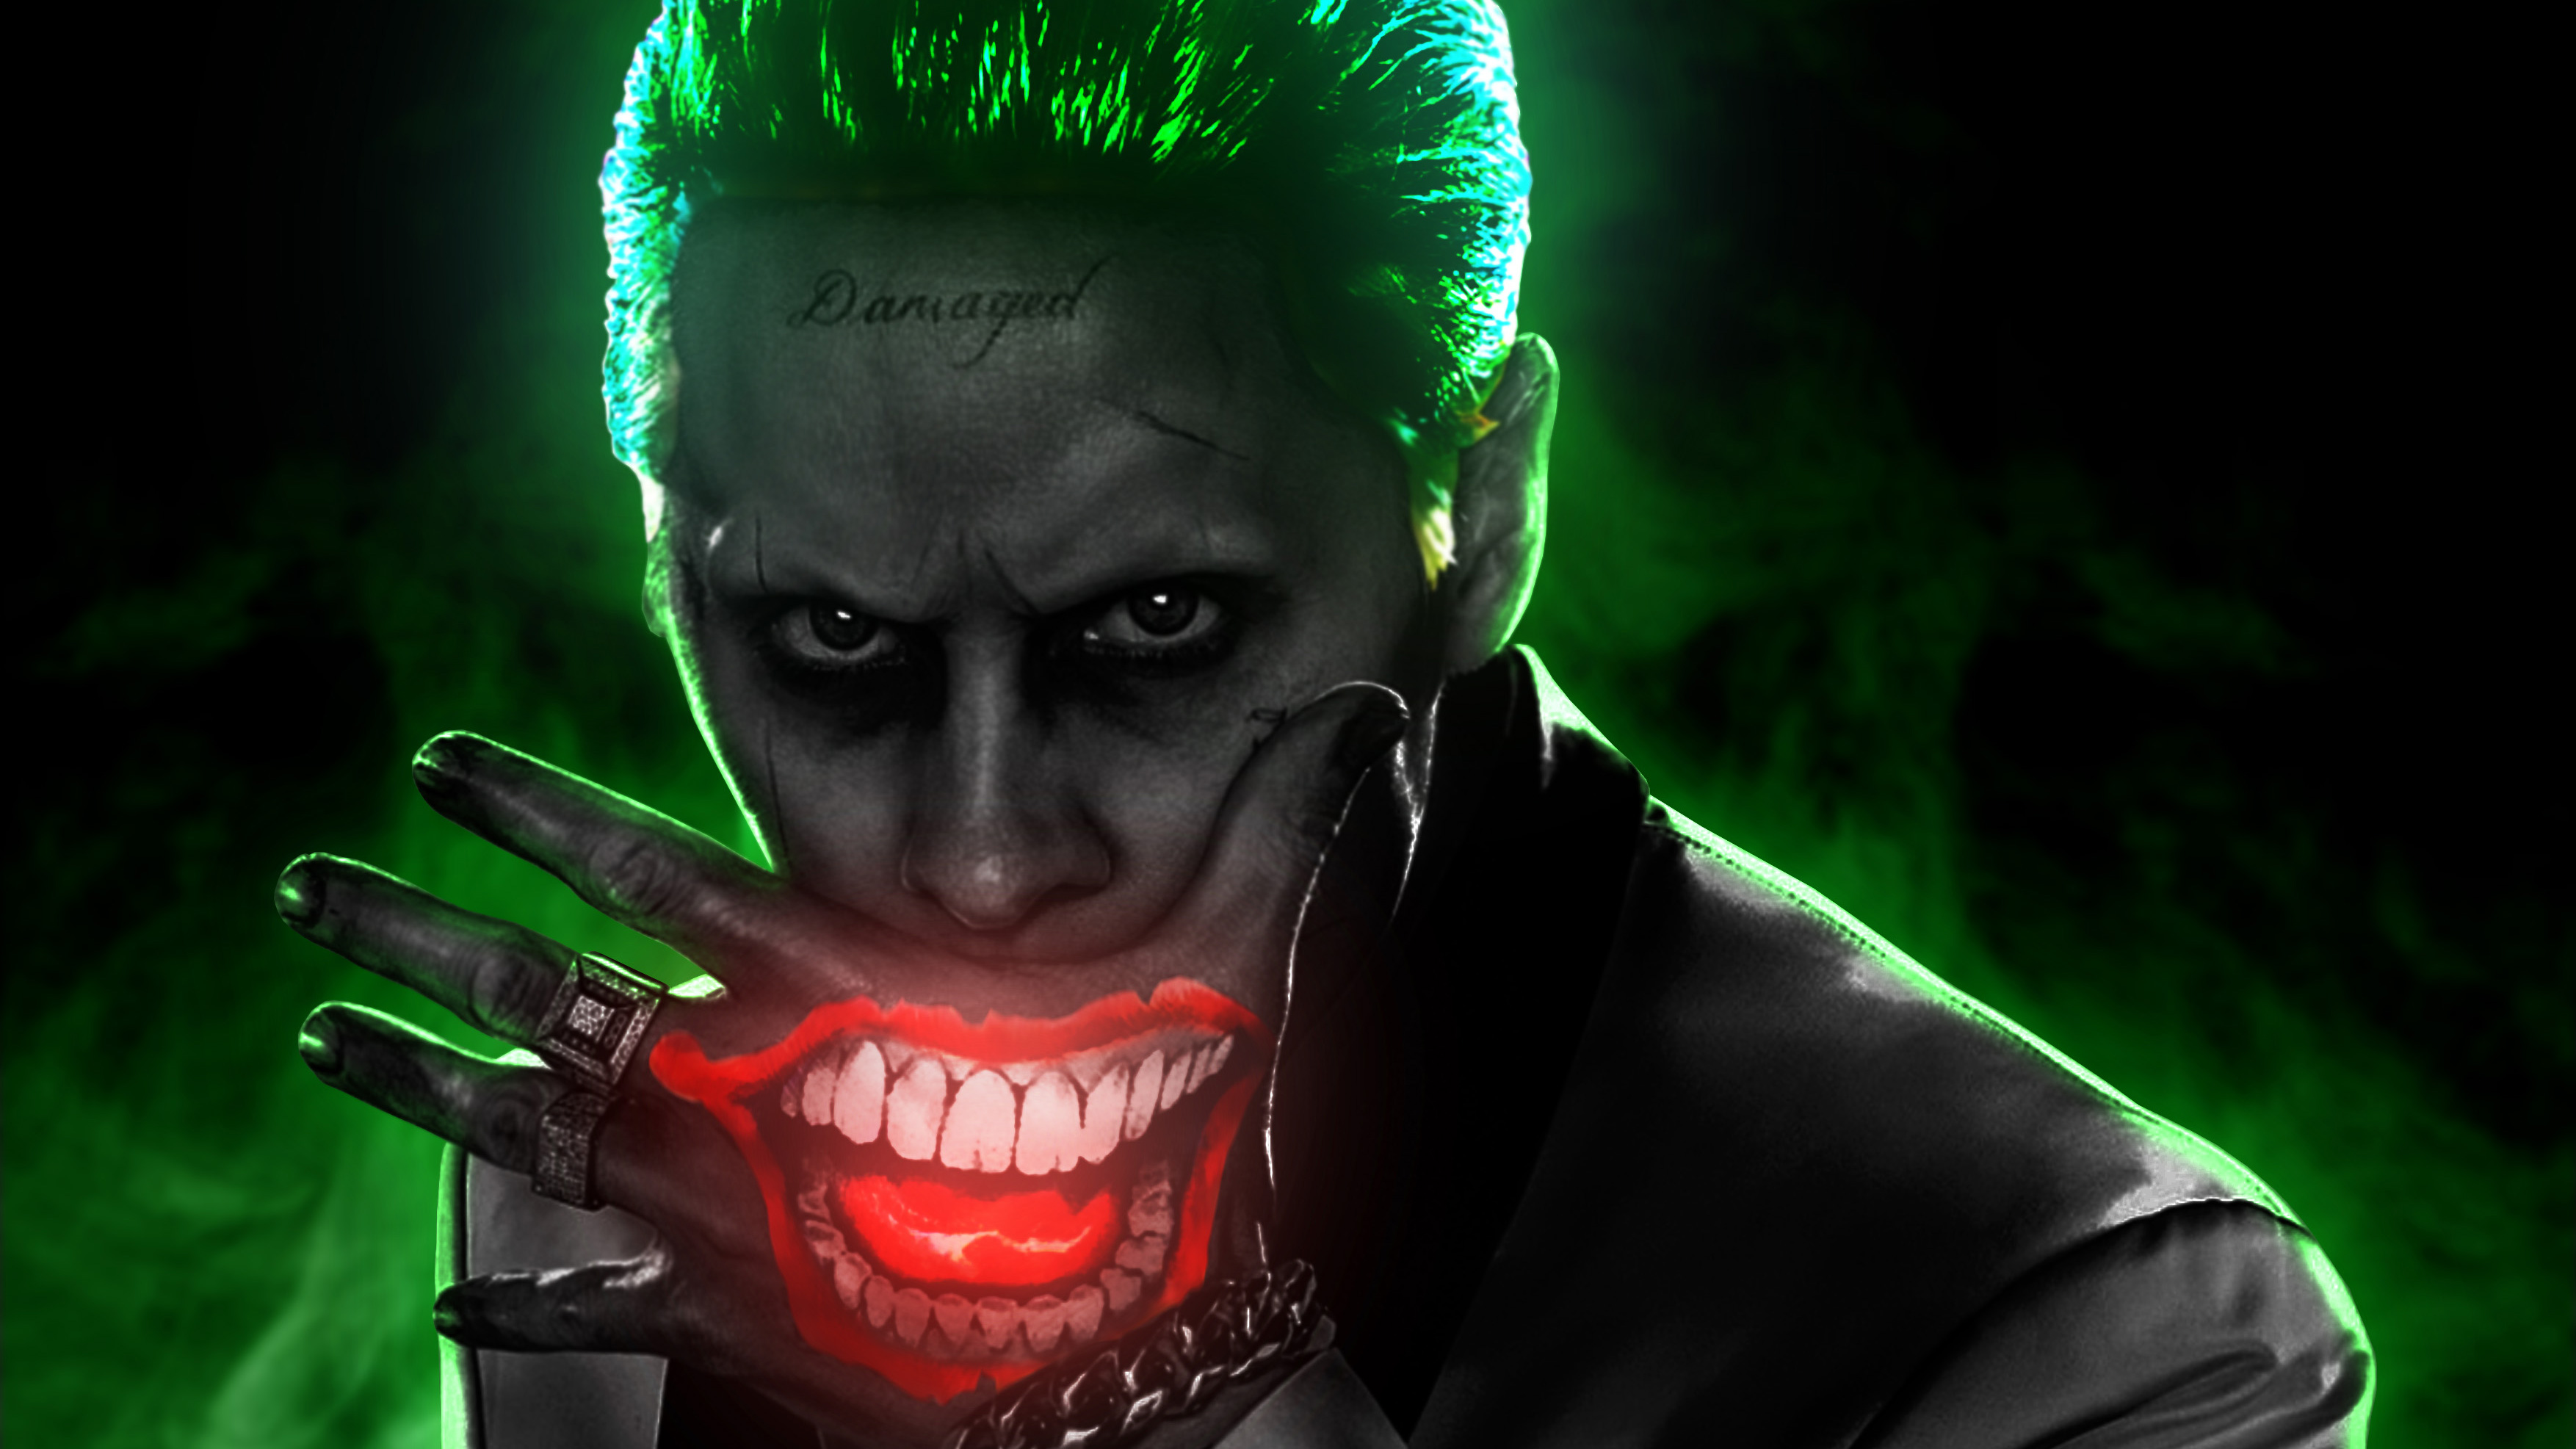 Jared Leto Joker 4k, HD Superheroes, 4k Wallpapers, Images ...